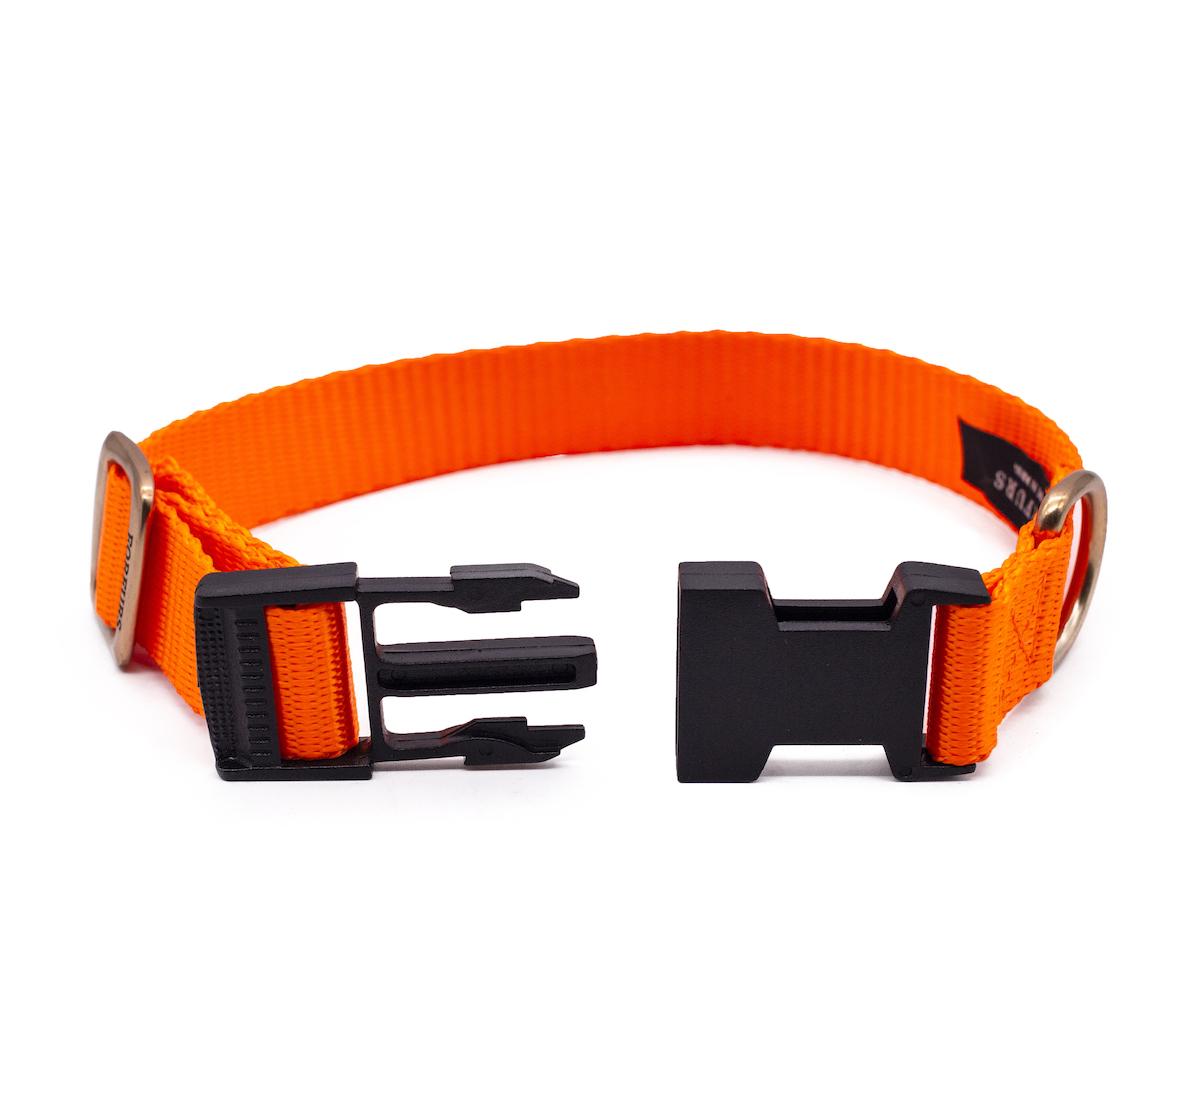 Forfurs Adjustable Classic Dog Collar Neon Orange - Medium